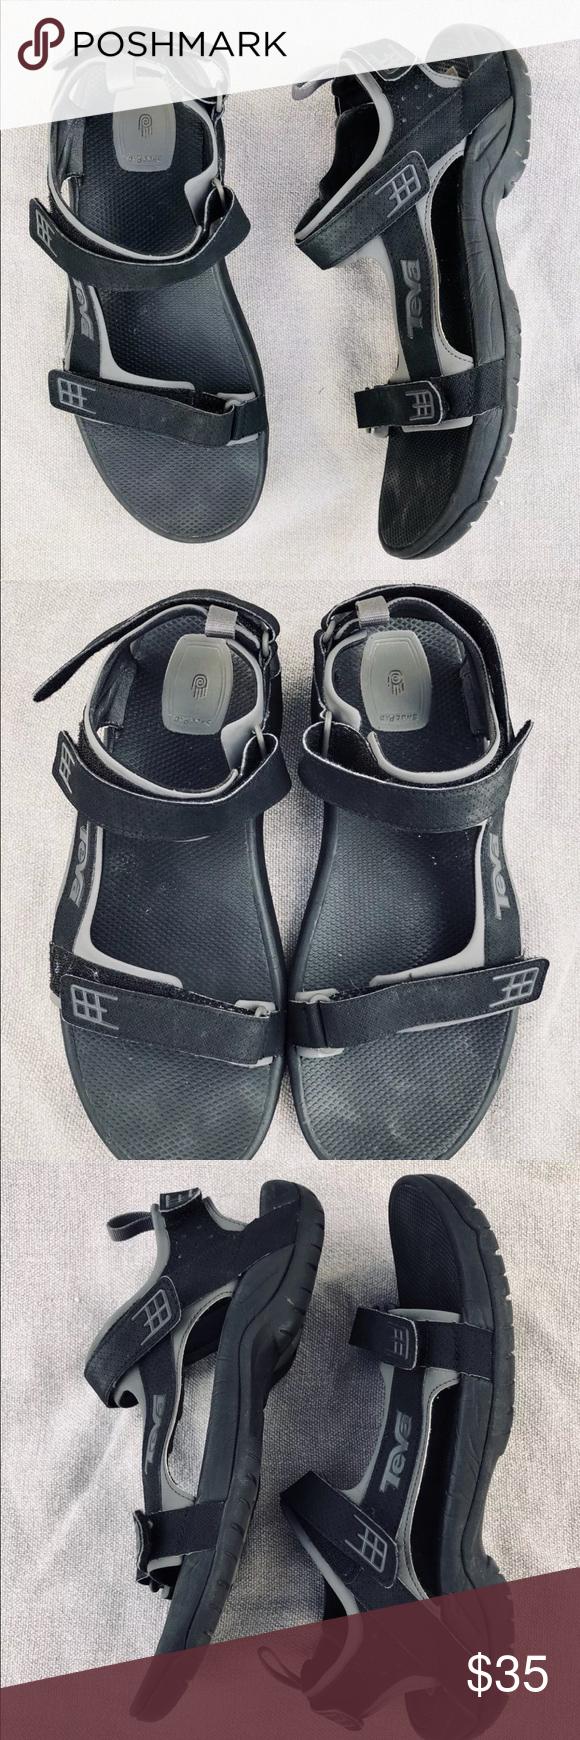 d457d45691bc Teva Minam Men s Black Leather Sport Sandals 13 Teva Minam S N 4289 Men s  Black Leather Sport Sandals Size 13   47 Teva Shoes Sandals   Flip-Flops